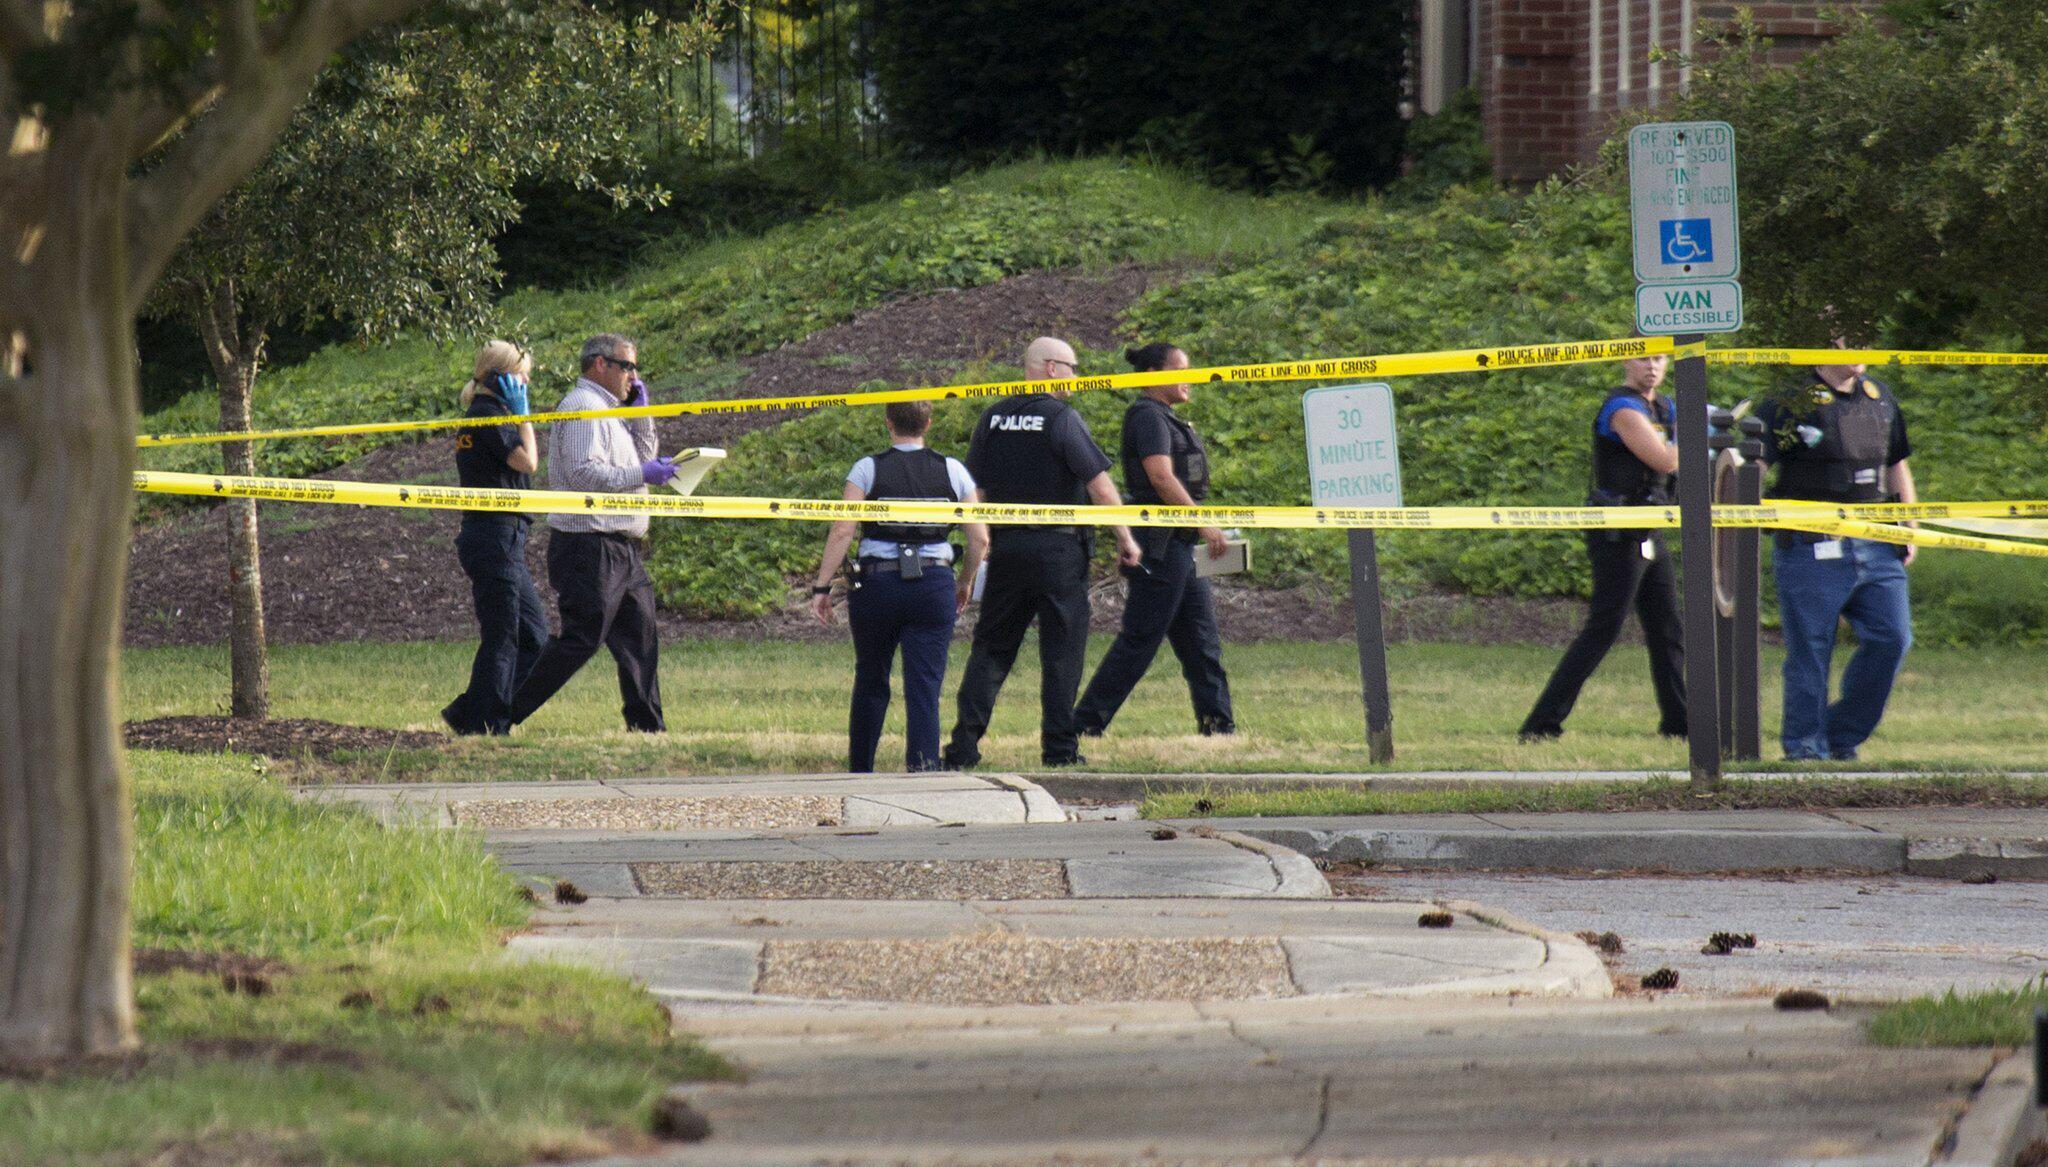 Bild zu Schütze richtet Massaker in US-Stadtverwaltung an